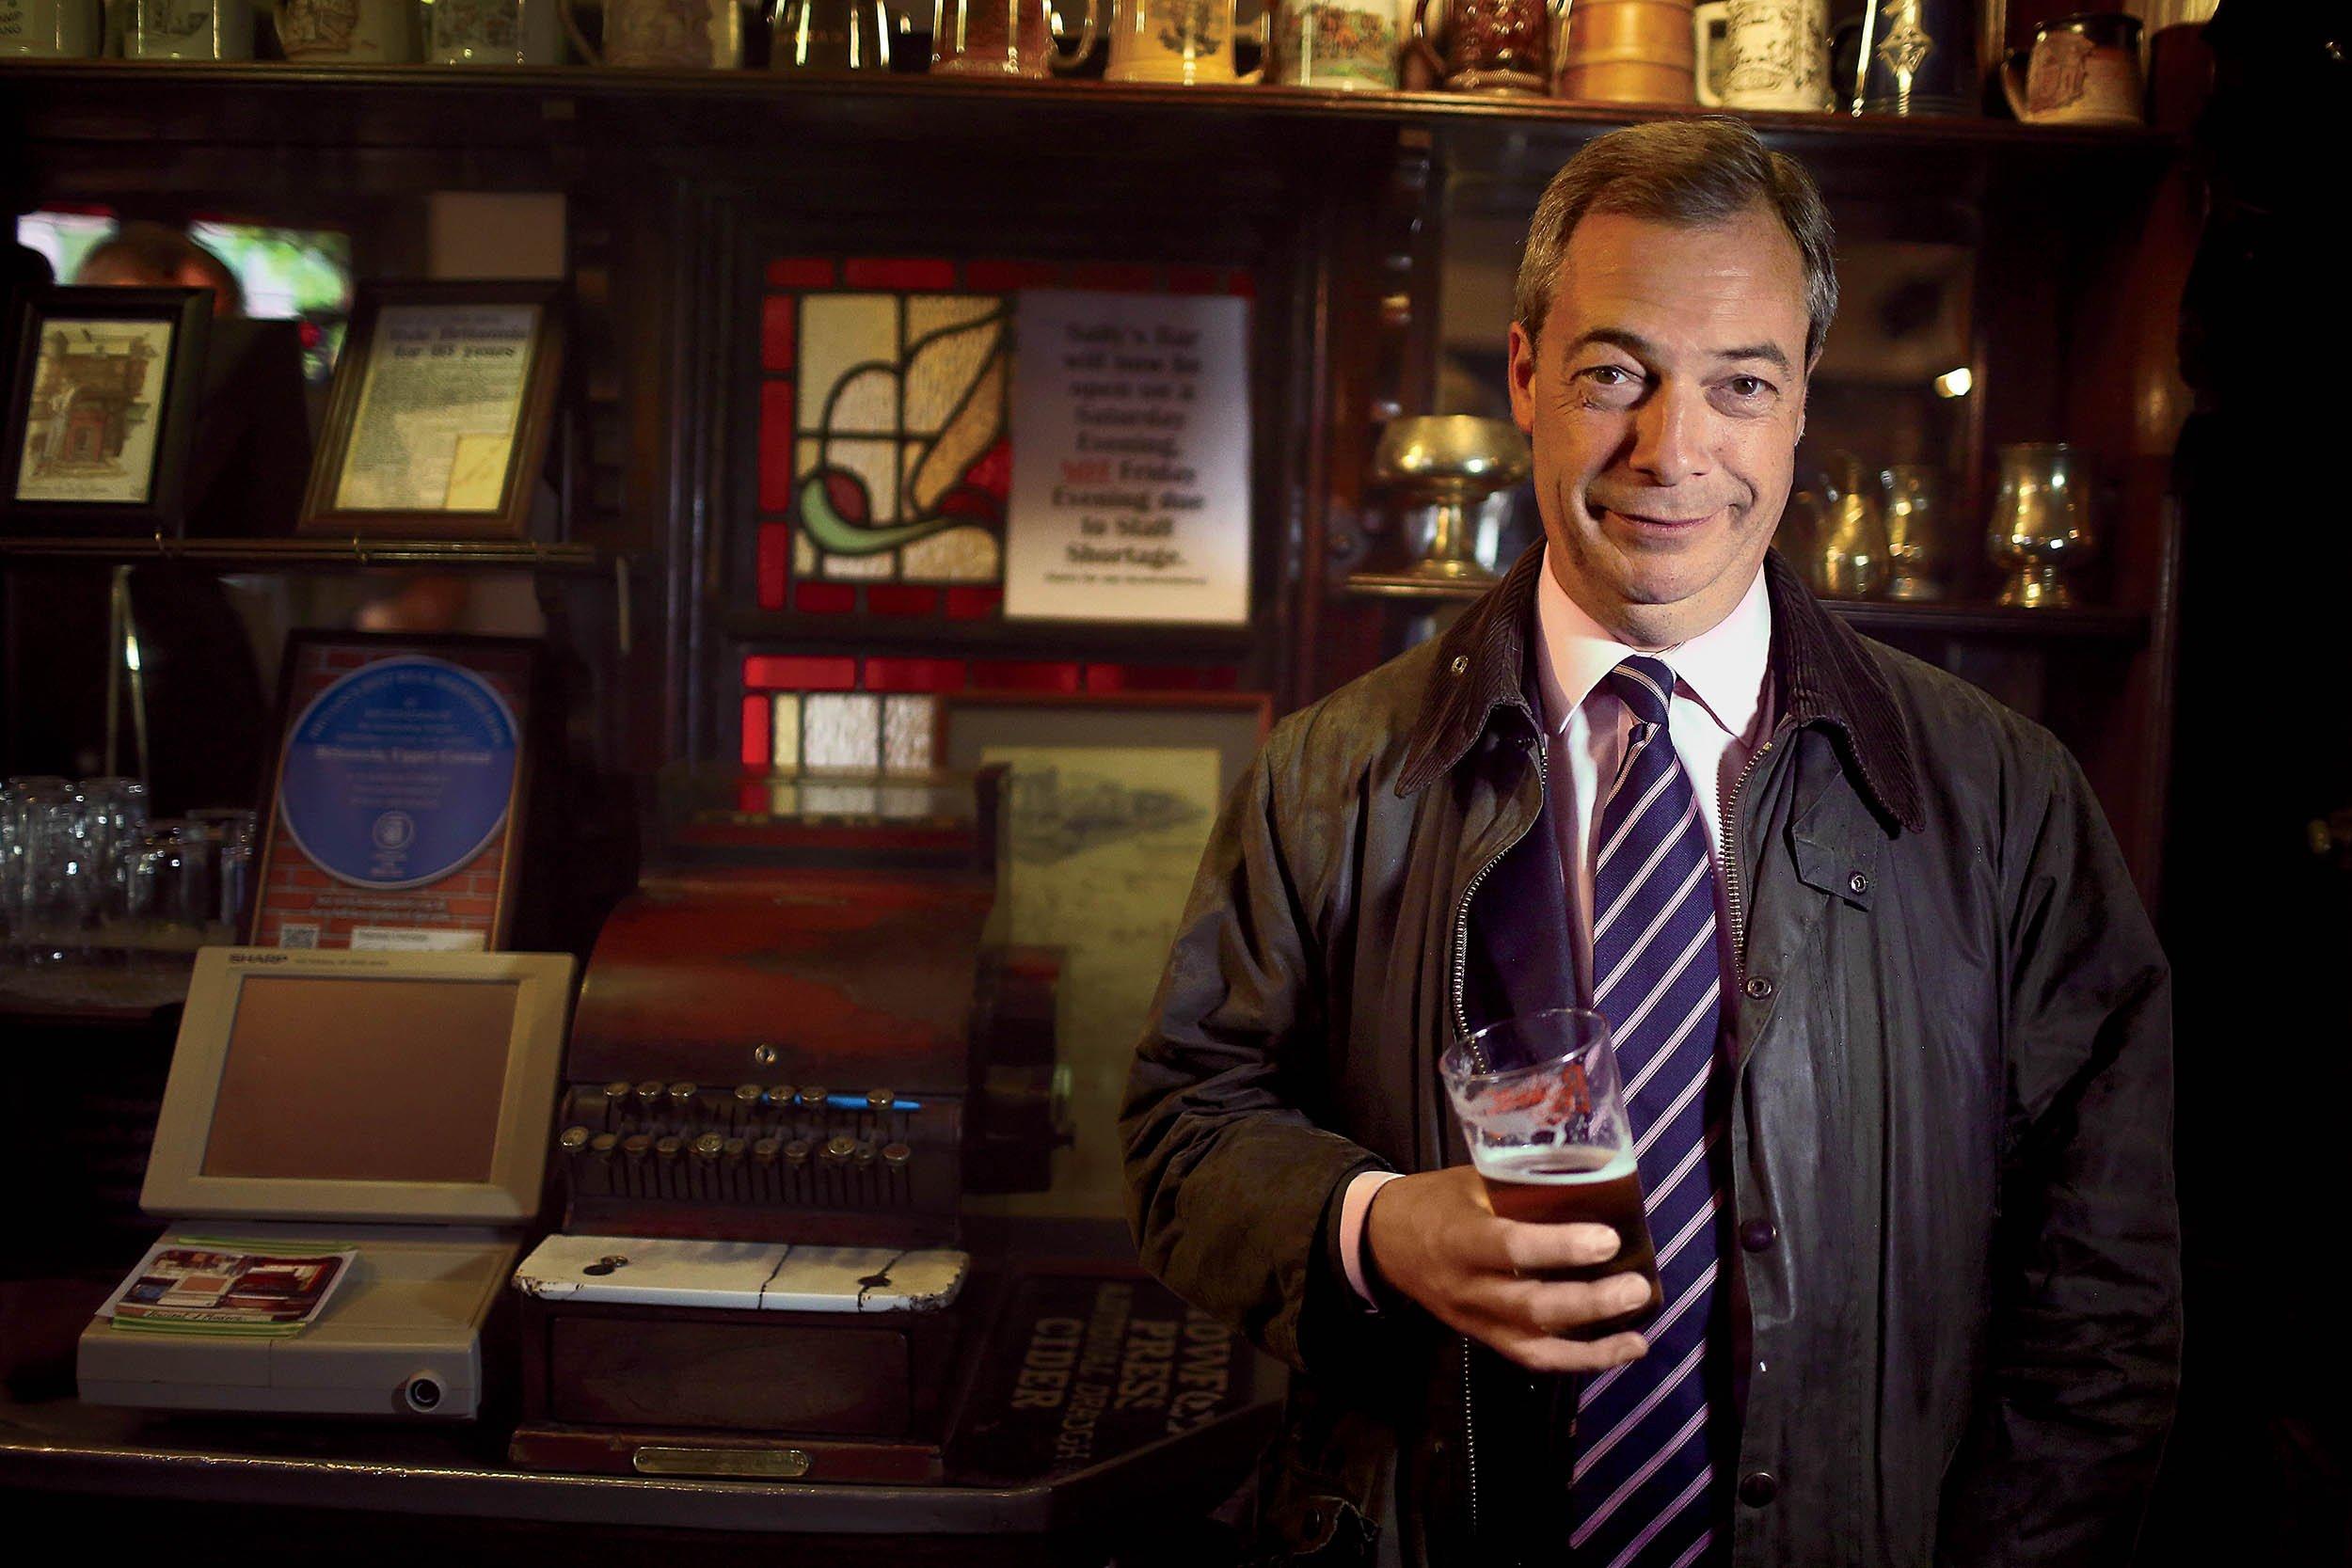 6.13_PG0224_Farage_01